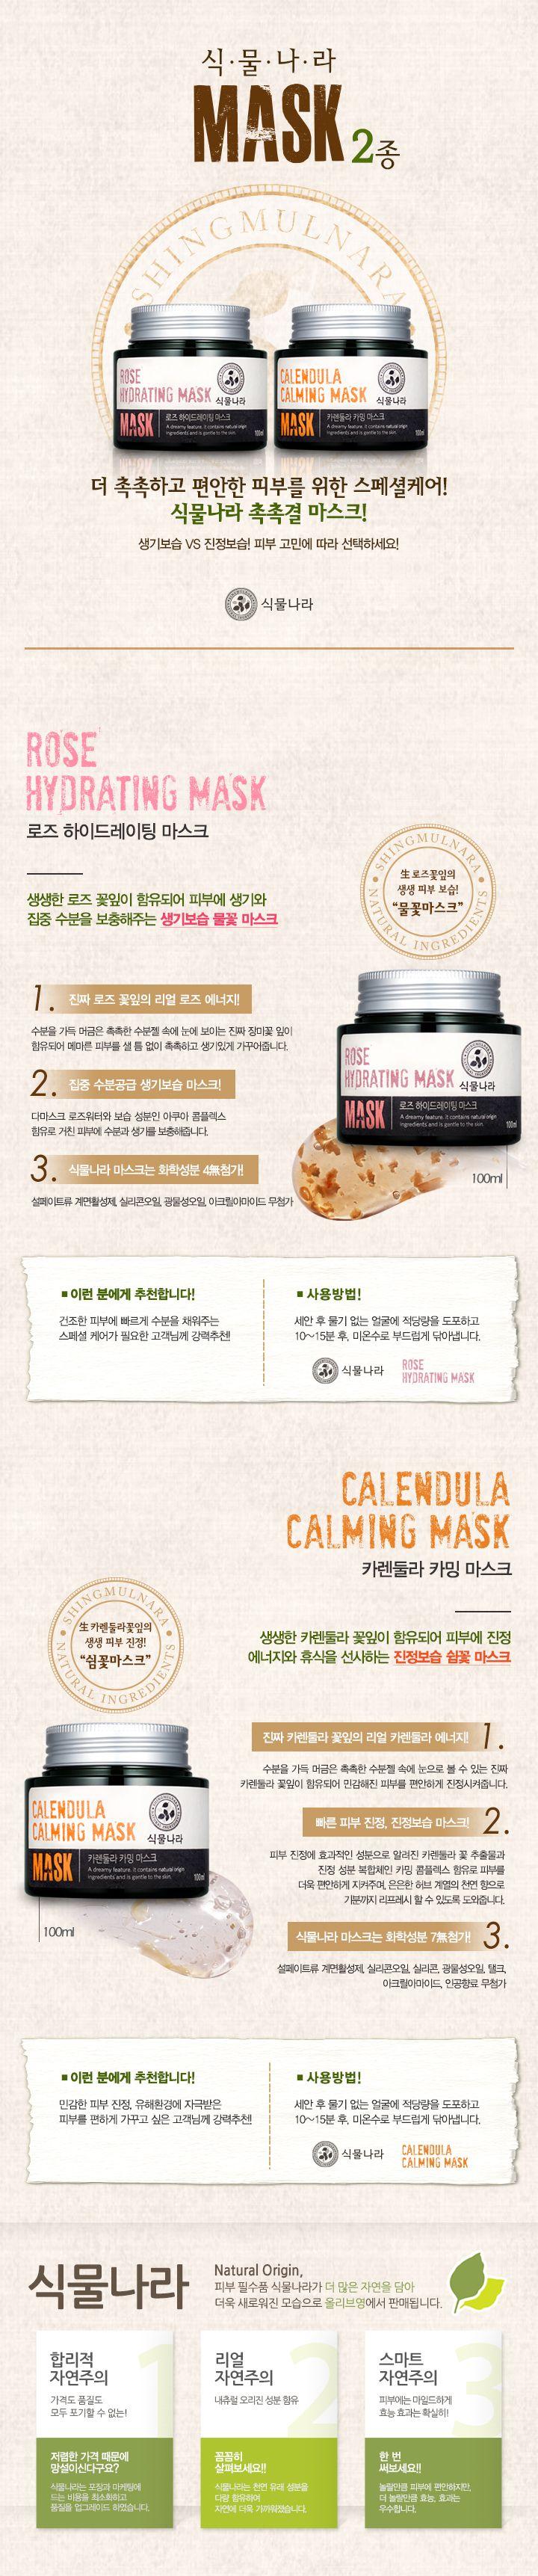 Shingmulnara Mask   The Cutest Makeup